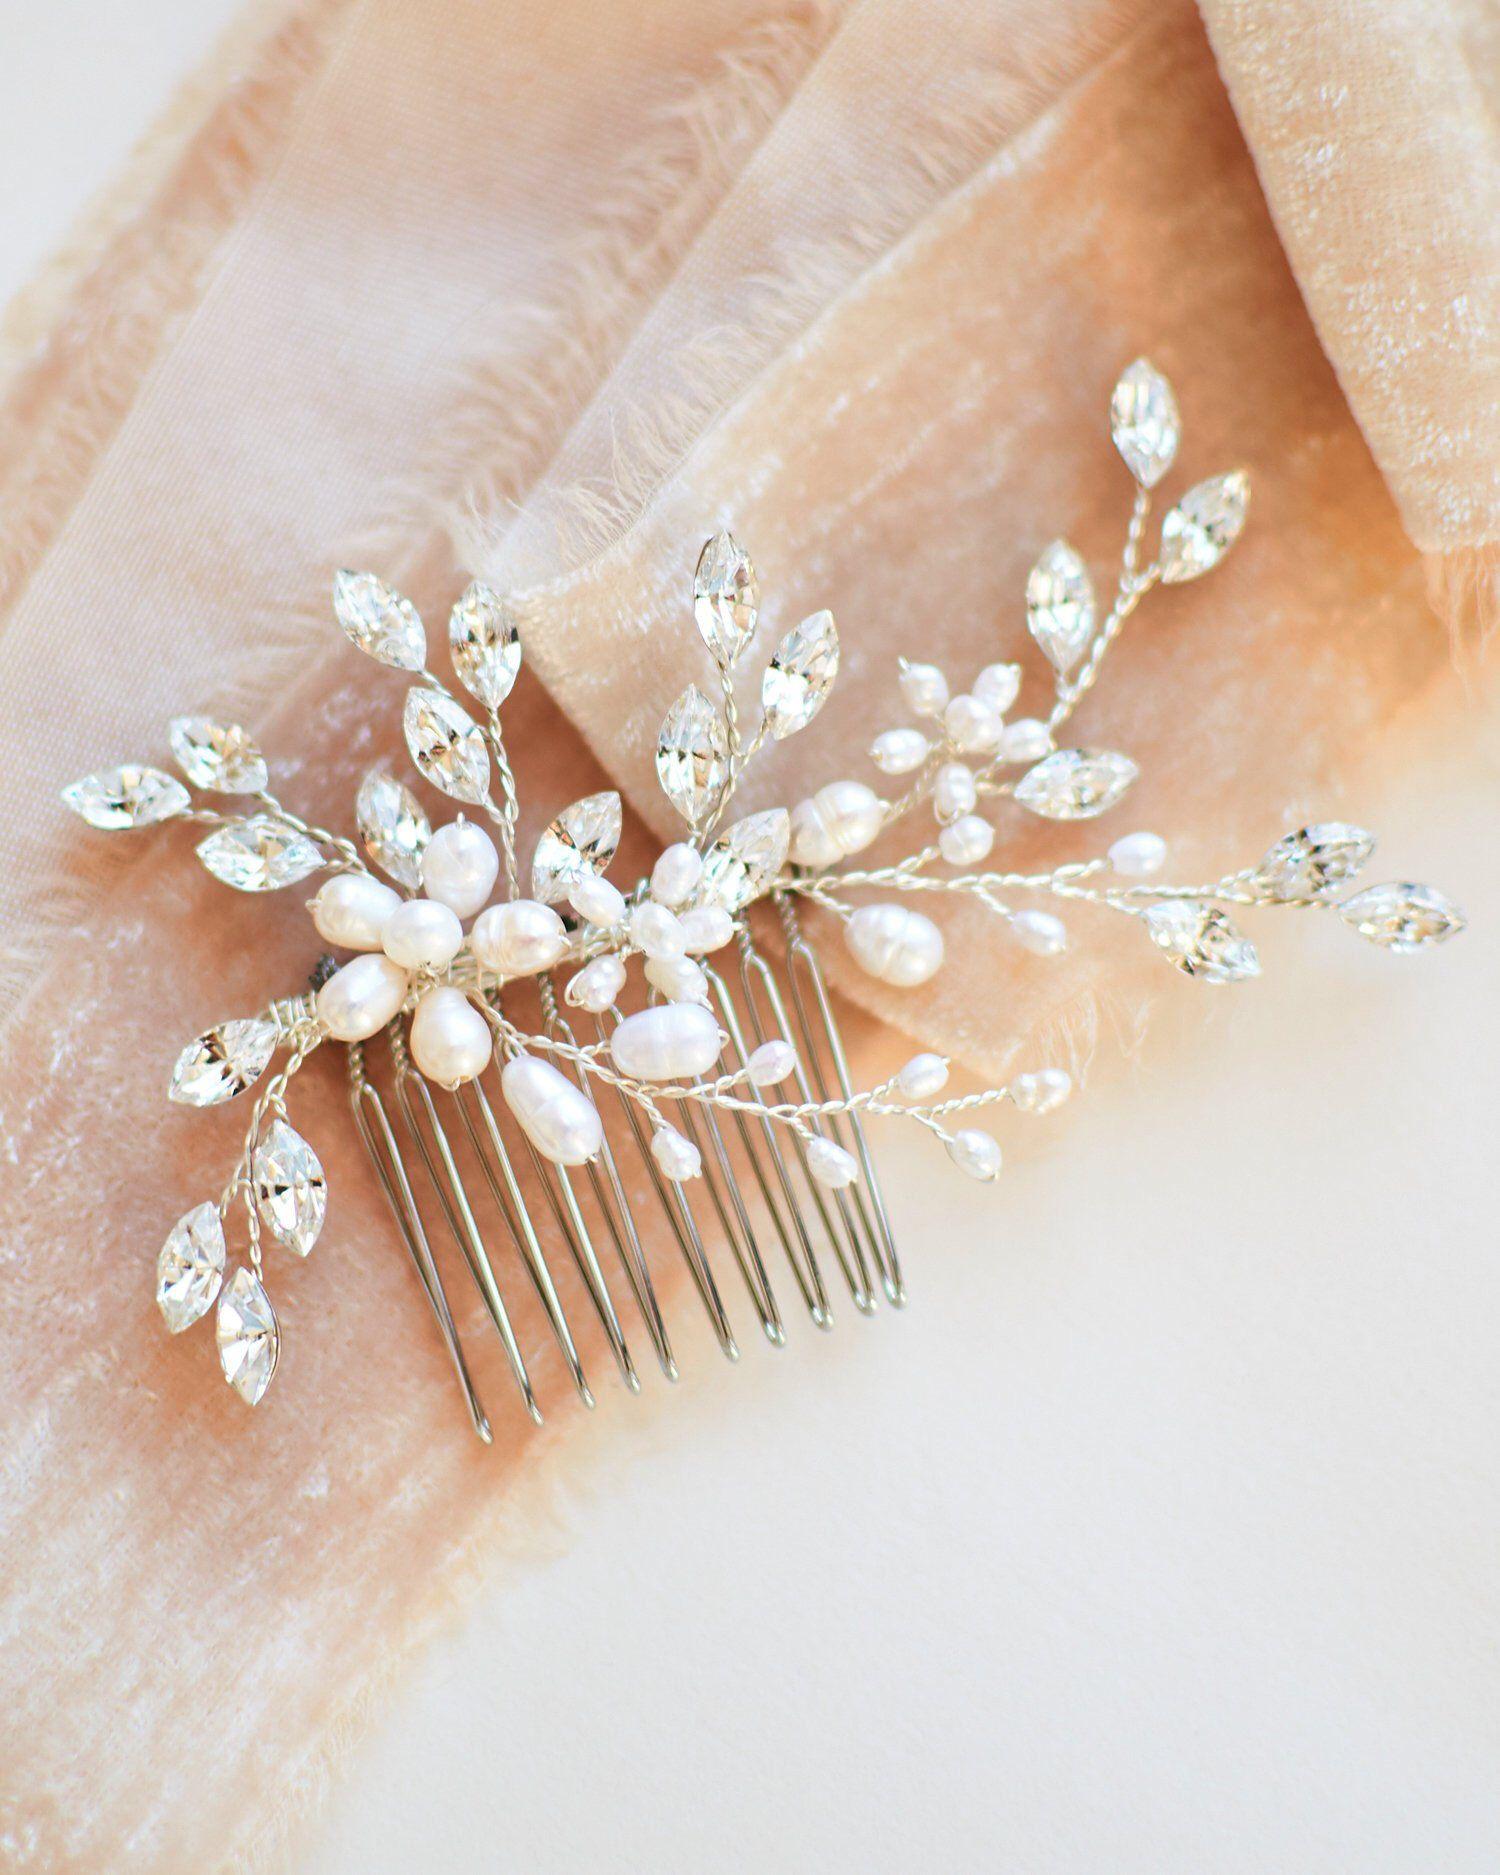 Freshwater Pearl Bridal Hair Comb Wedding Hair Comb Bridal Etsy In 2020 Silver Bridal Hair Comb Bridal Hair Combs Pearl Bridal Comb